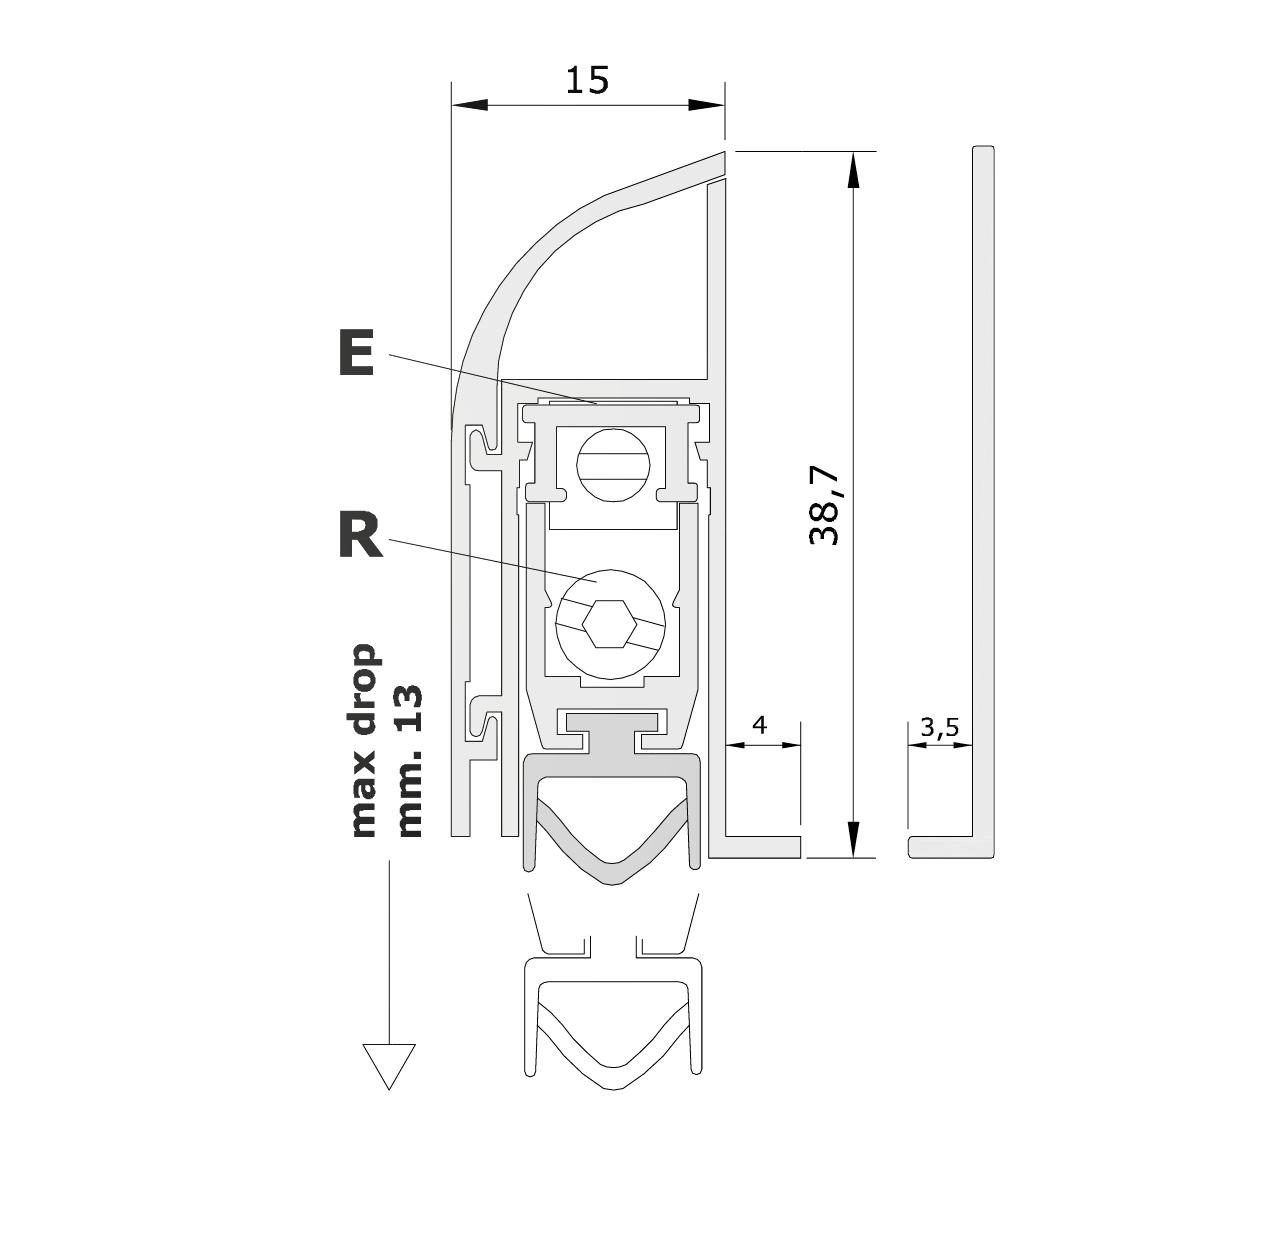 Misure standard (mm) per il paraspifferi Serie Comax 1760